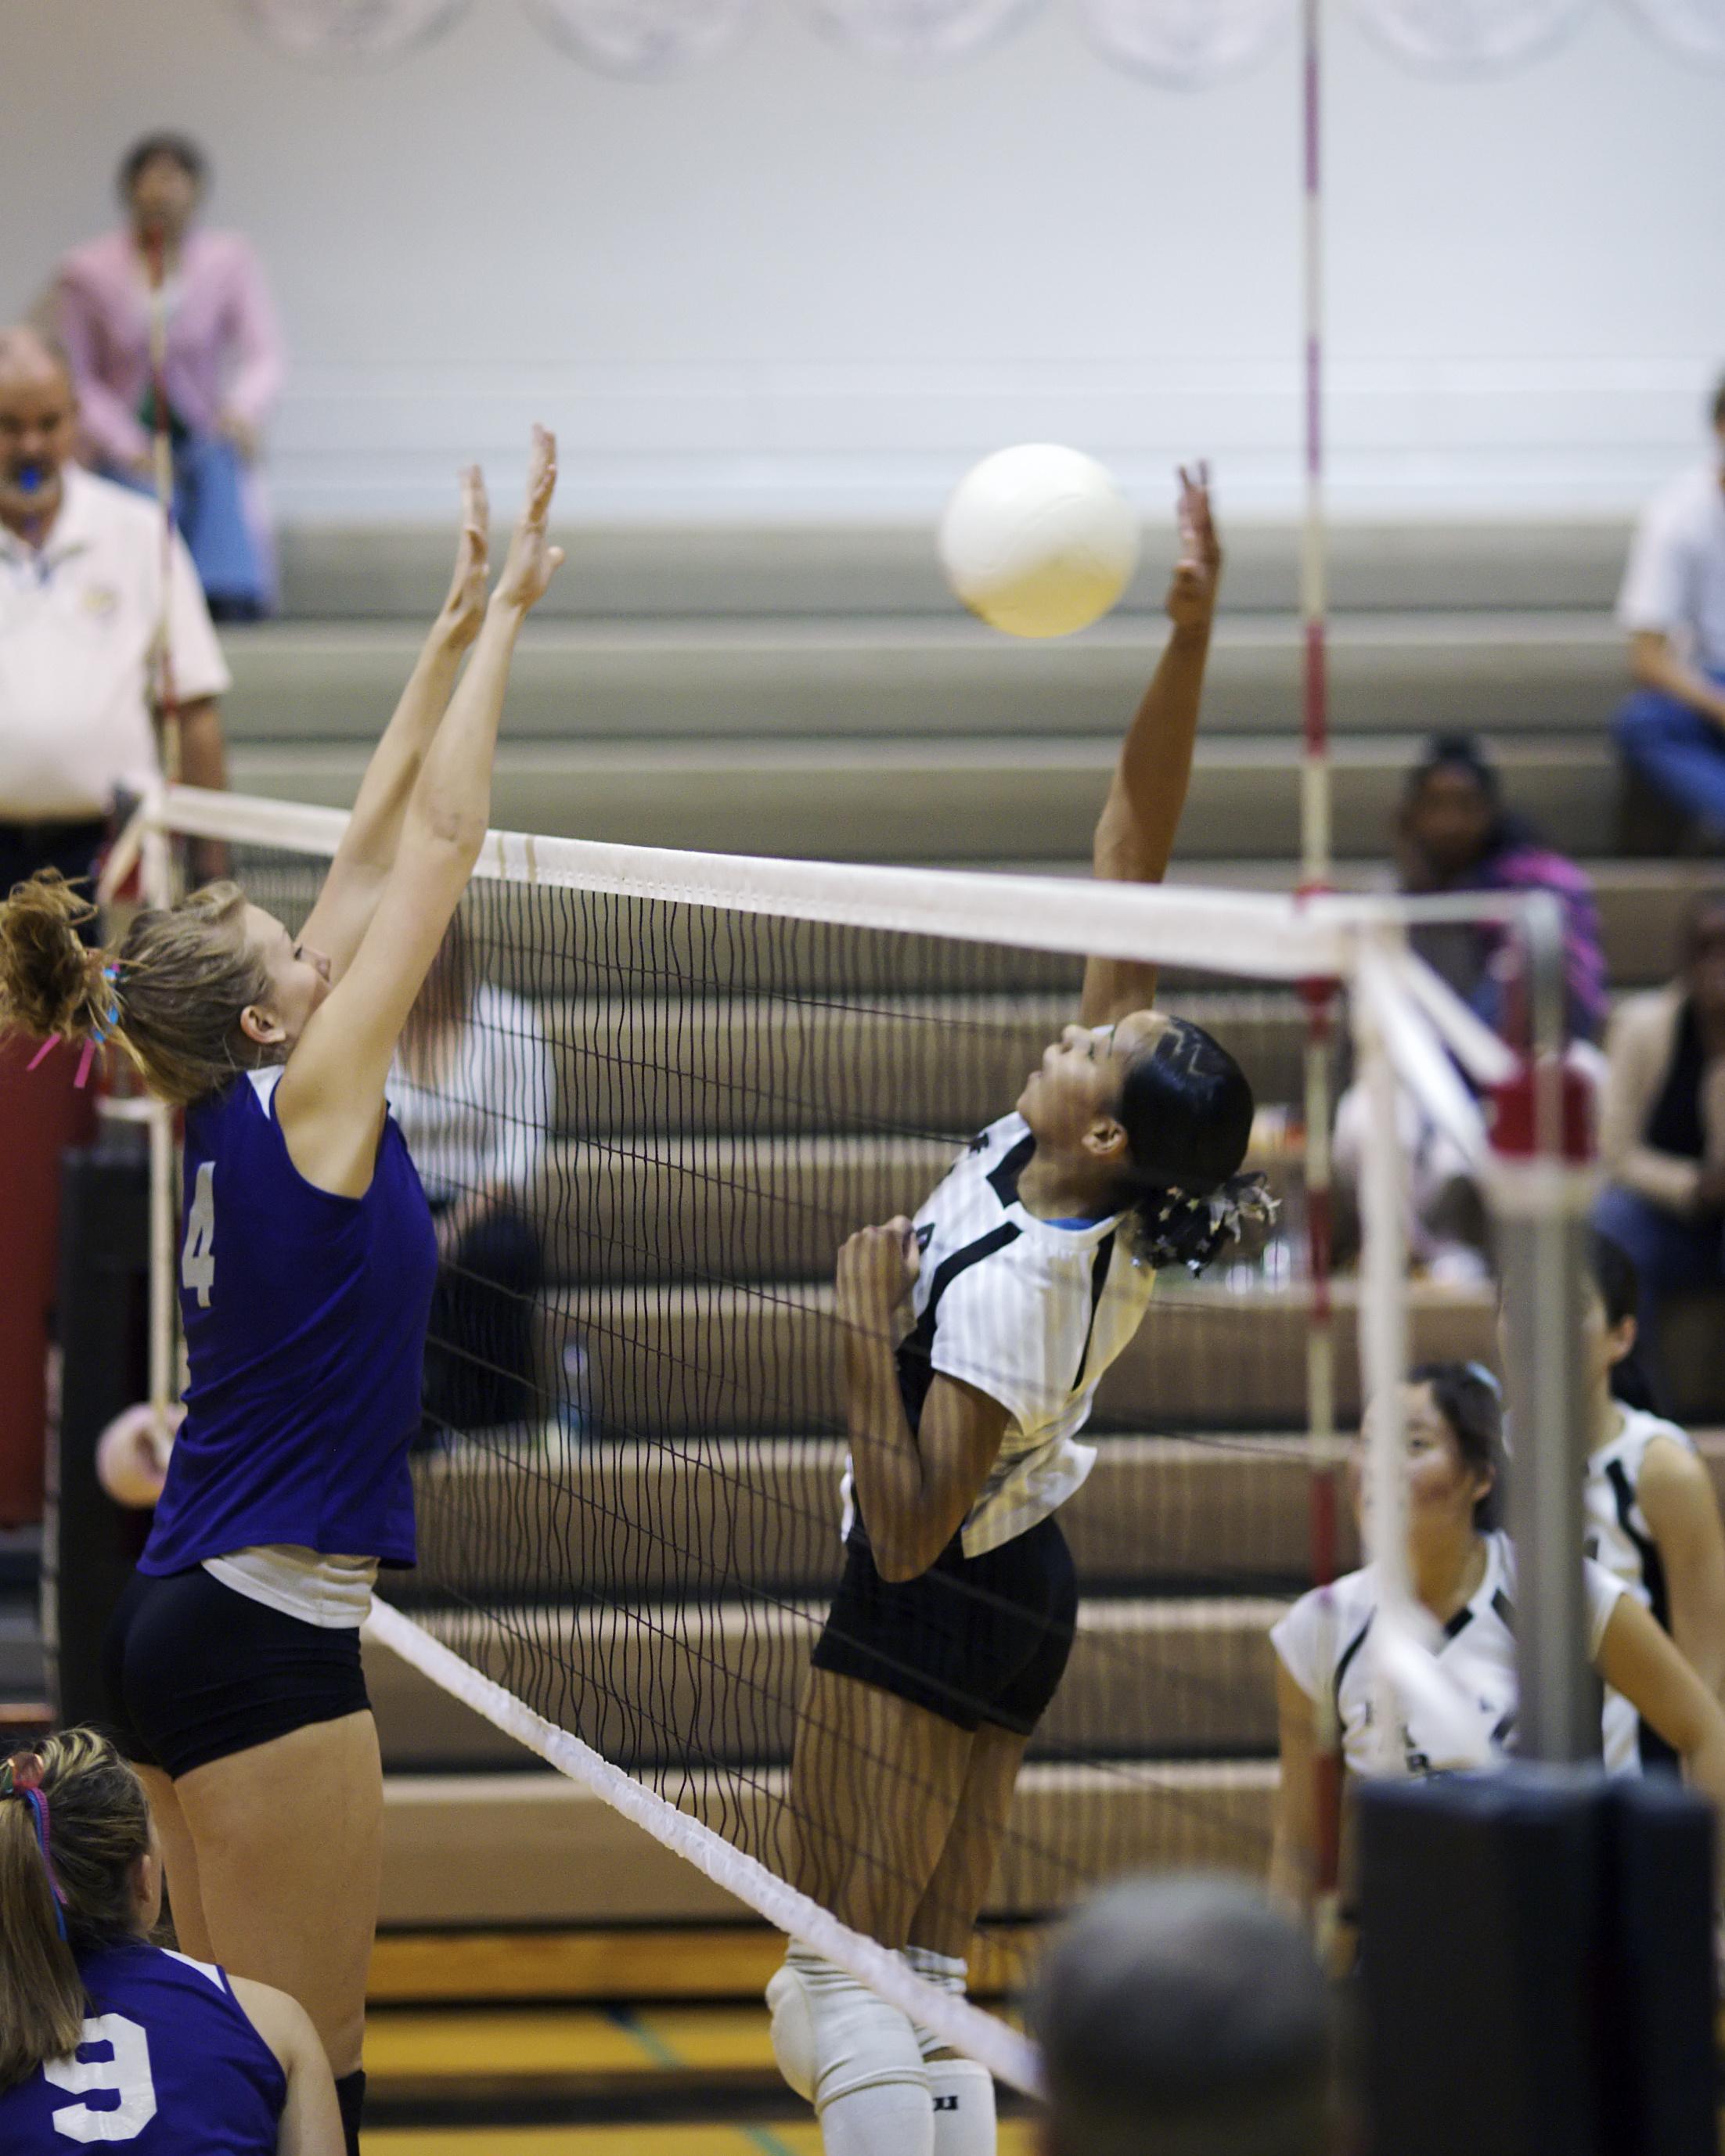 Volleyball Spike